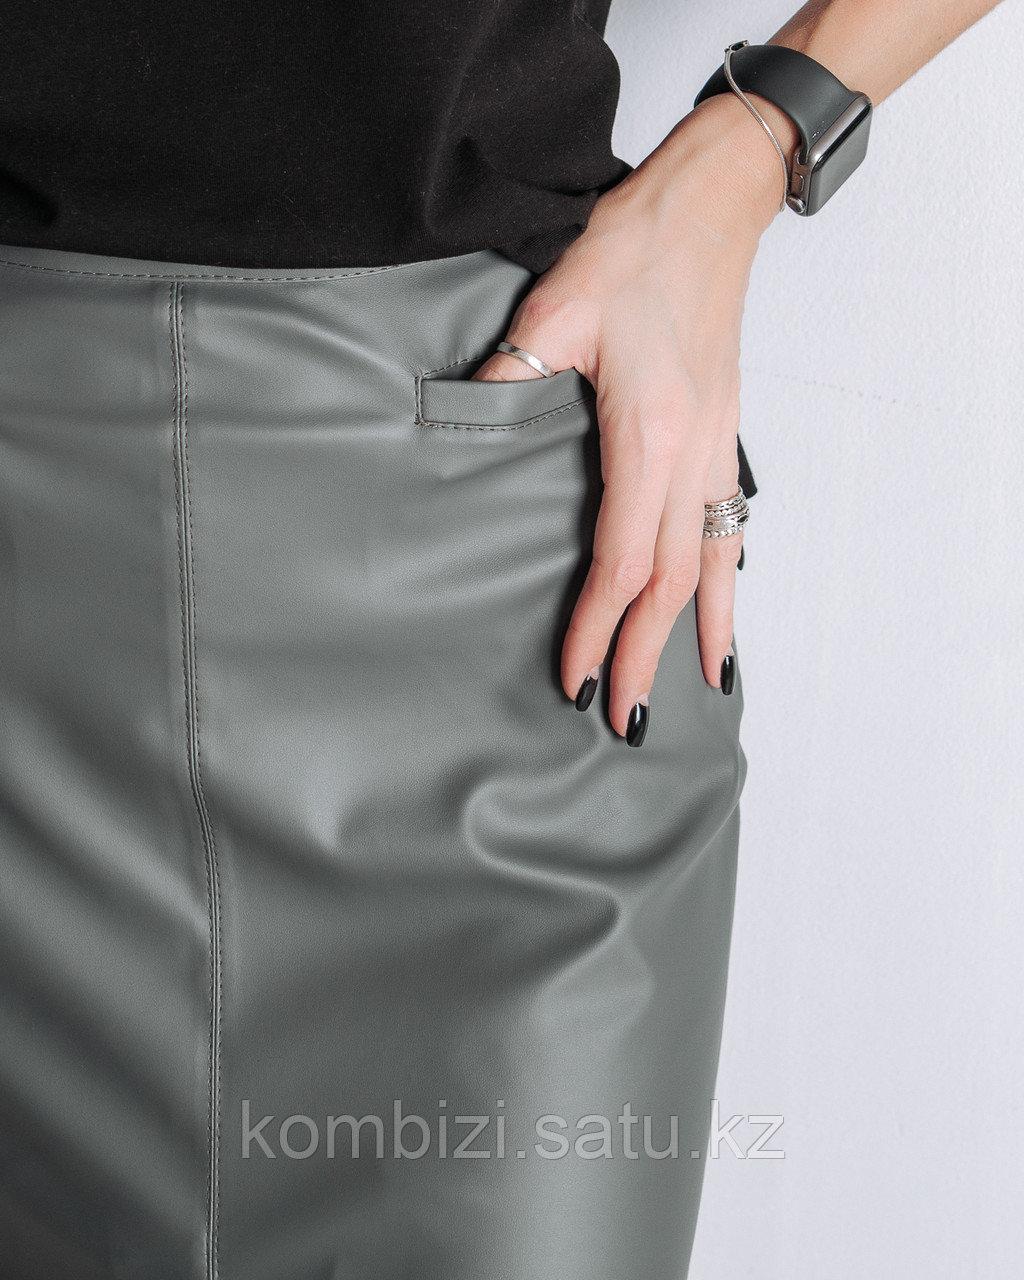 Юбка из экокожи Classic, серая - фото 2